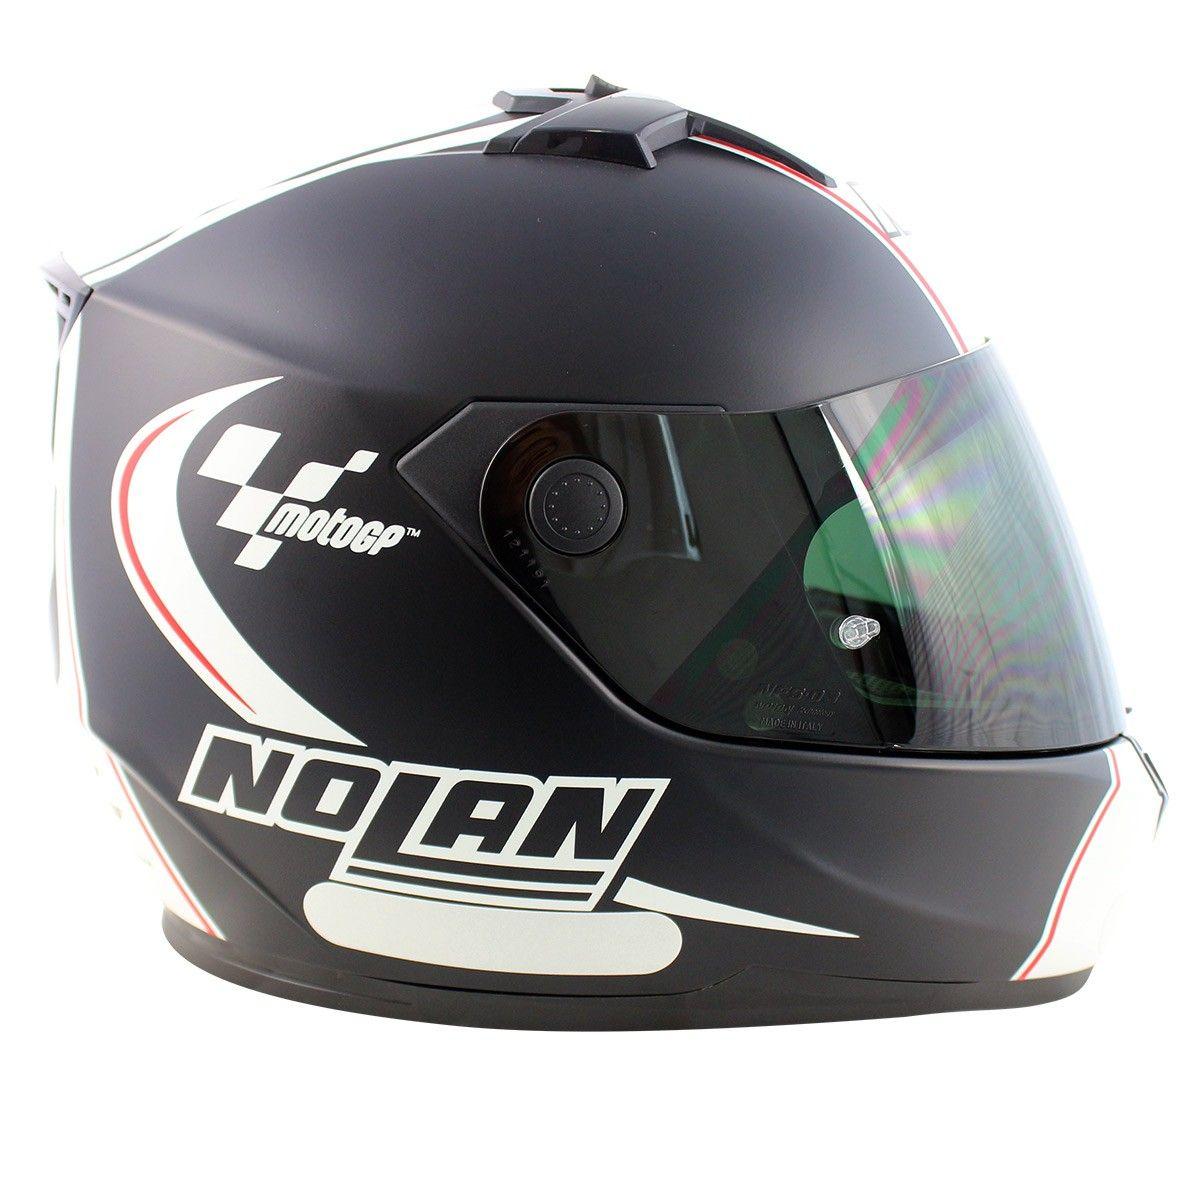 0 Capacete Nolan N64 MotoGP Flat Black c/ Branco - GANHE TOUCA BALACLAVA